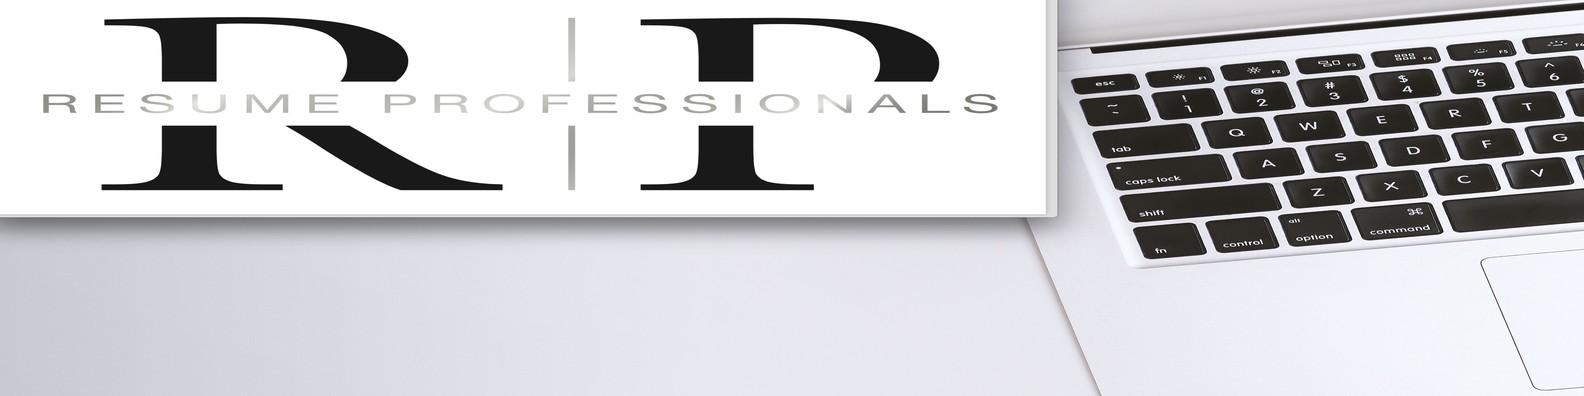 Resume Professionals Linkedin